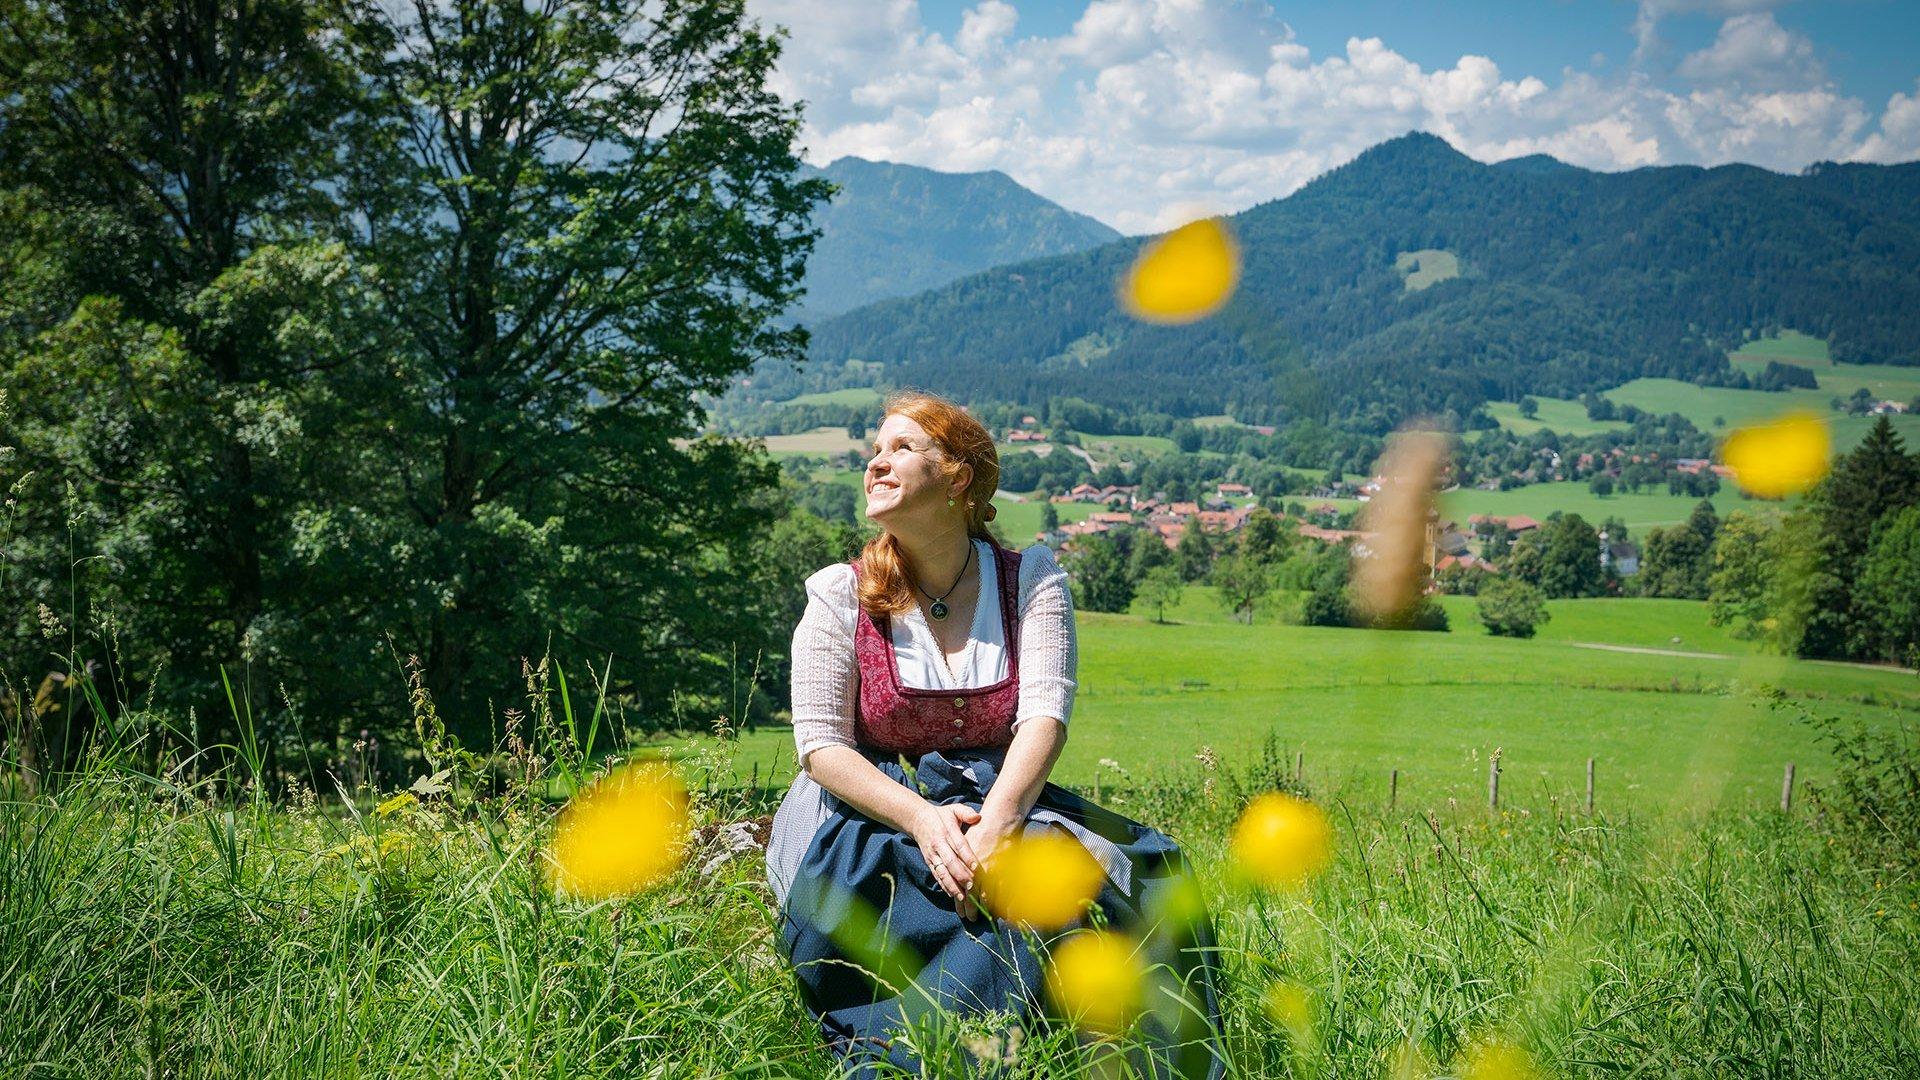 Michaela Schmitz-Guggenbichler Fischbachau, © Dietmar Denger